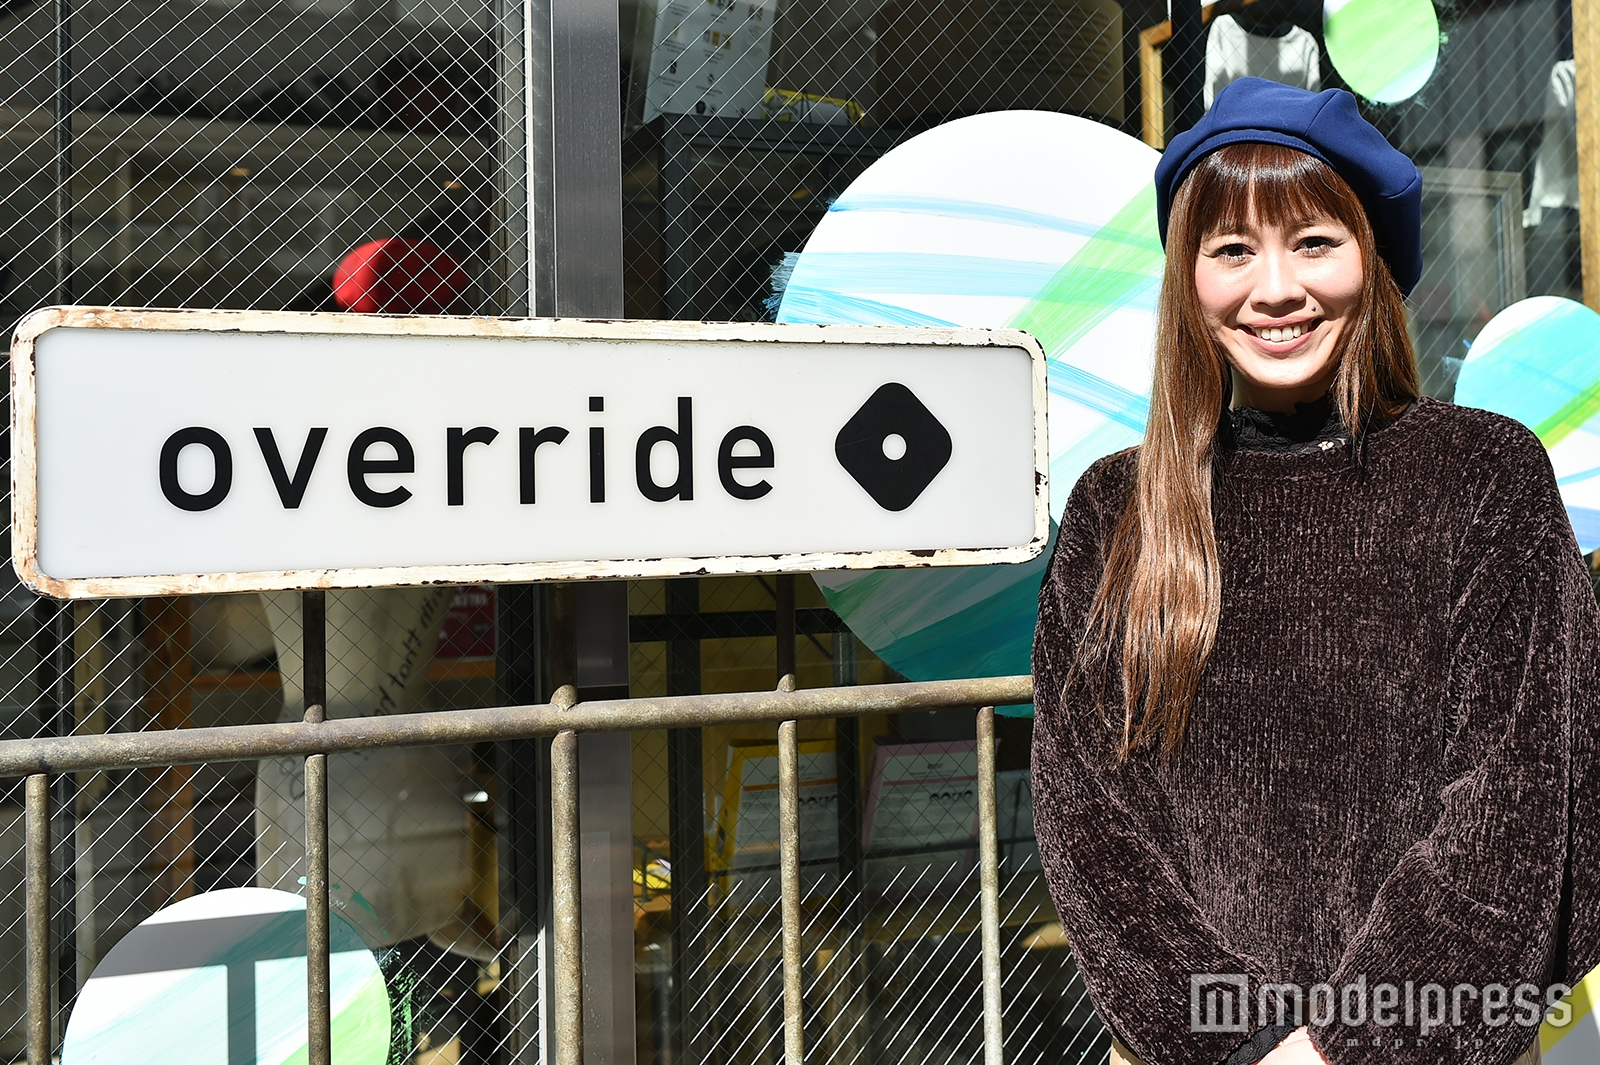 「override」明治通り店店長の草薙未奈子さん(C)モデルプレス